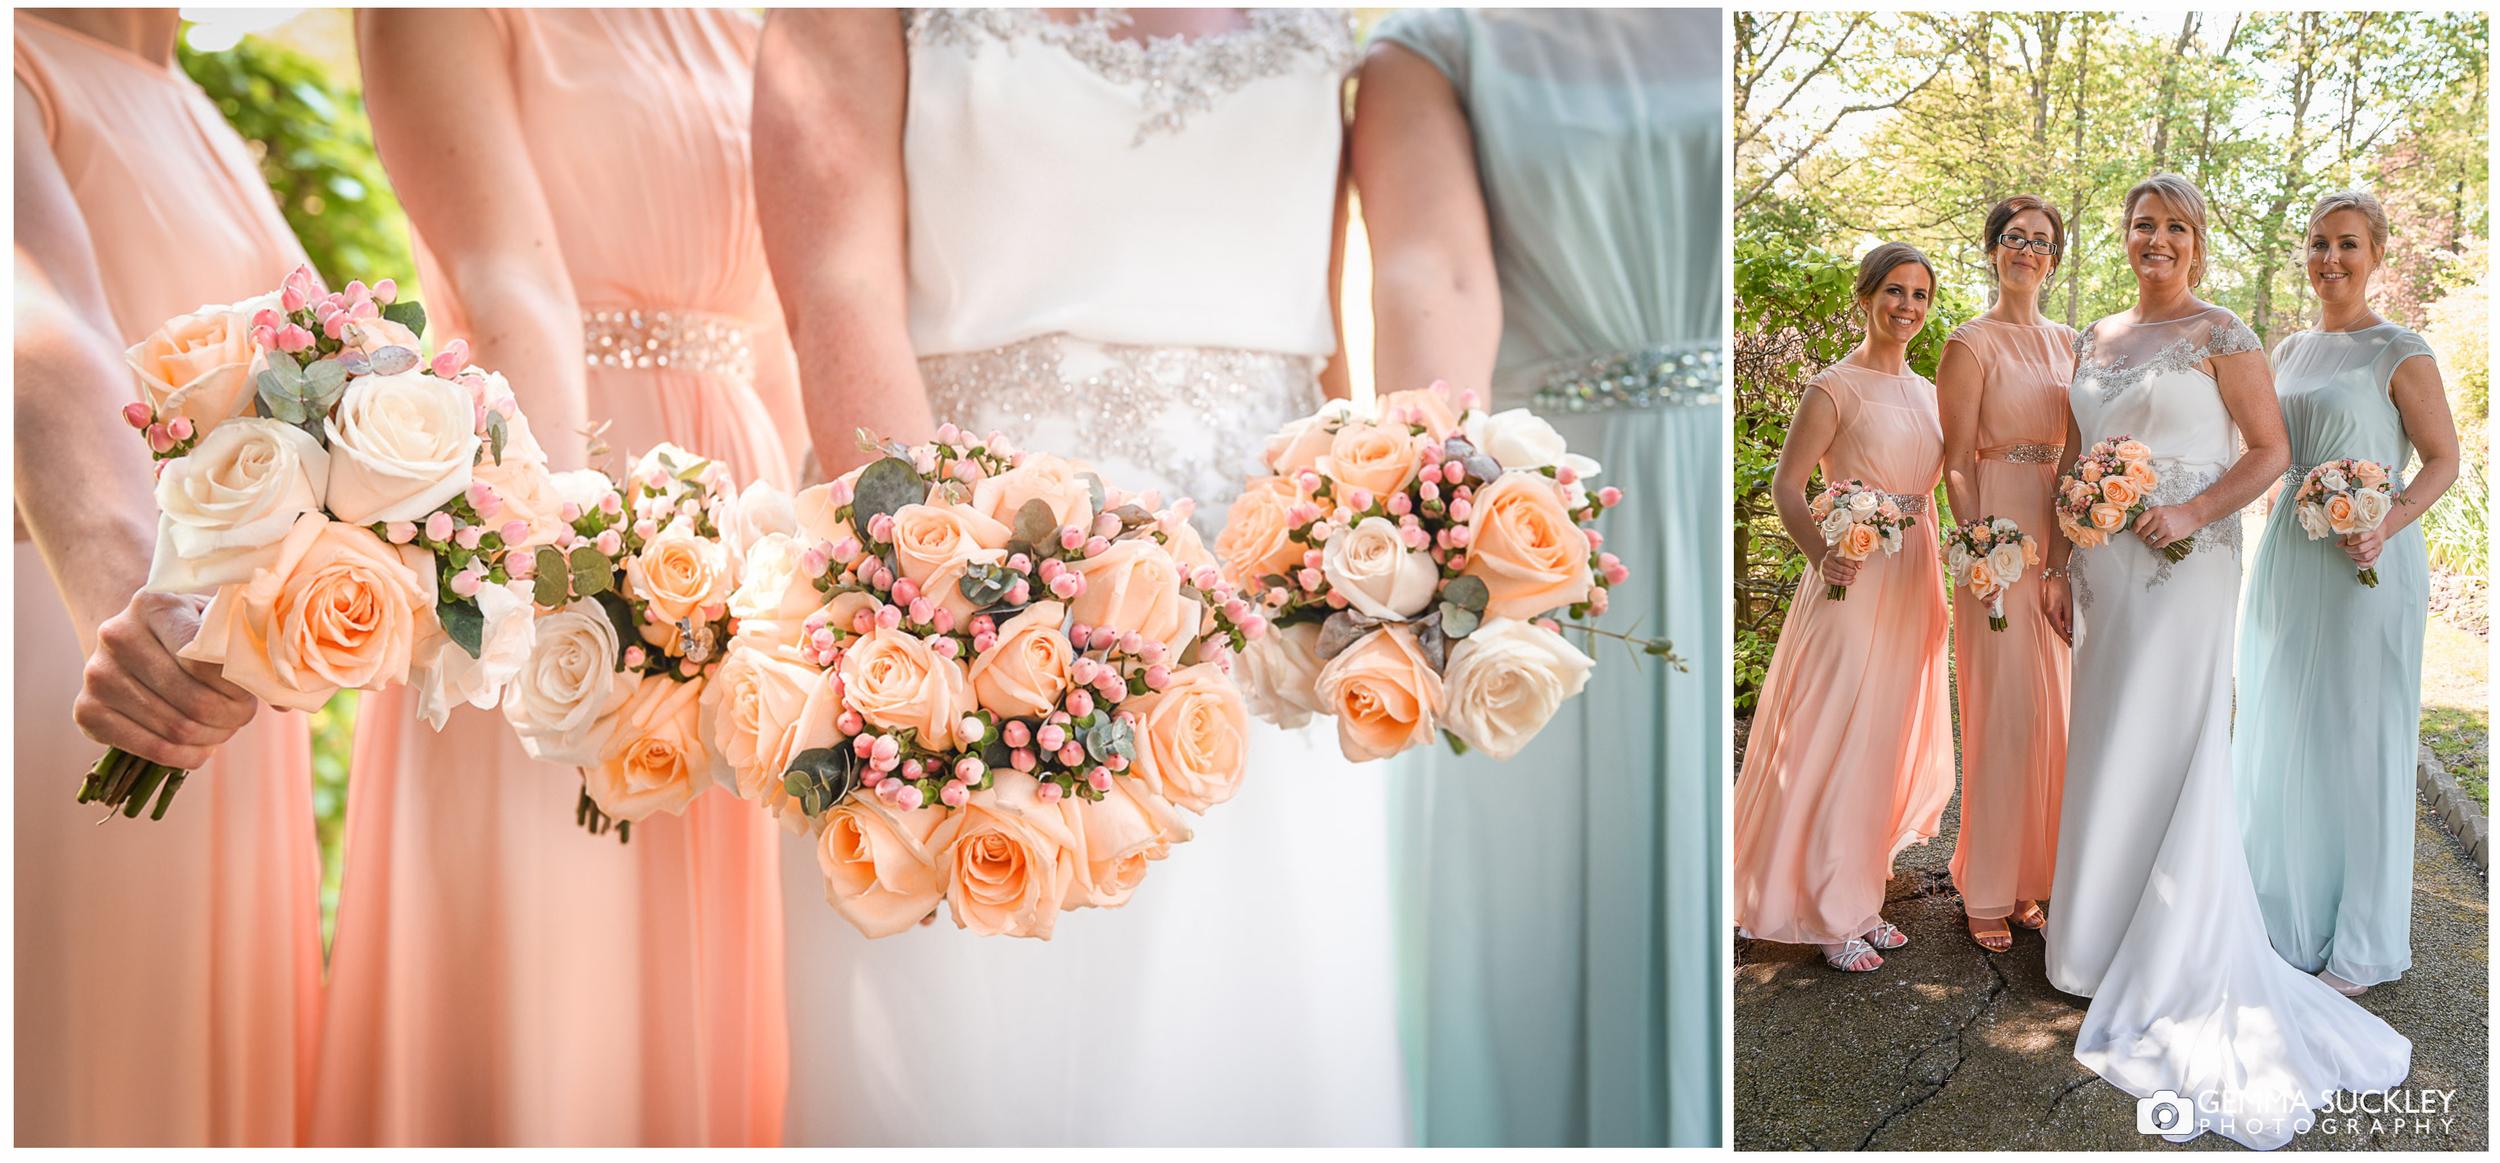 wedding-boqeut-by-natasha-evens-events©gemmasuckleyphotography.jpg